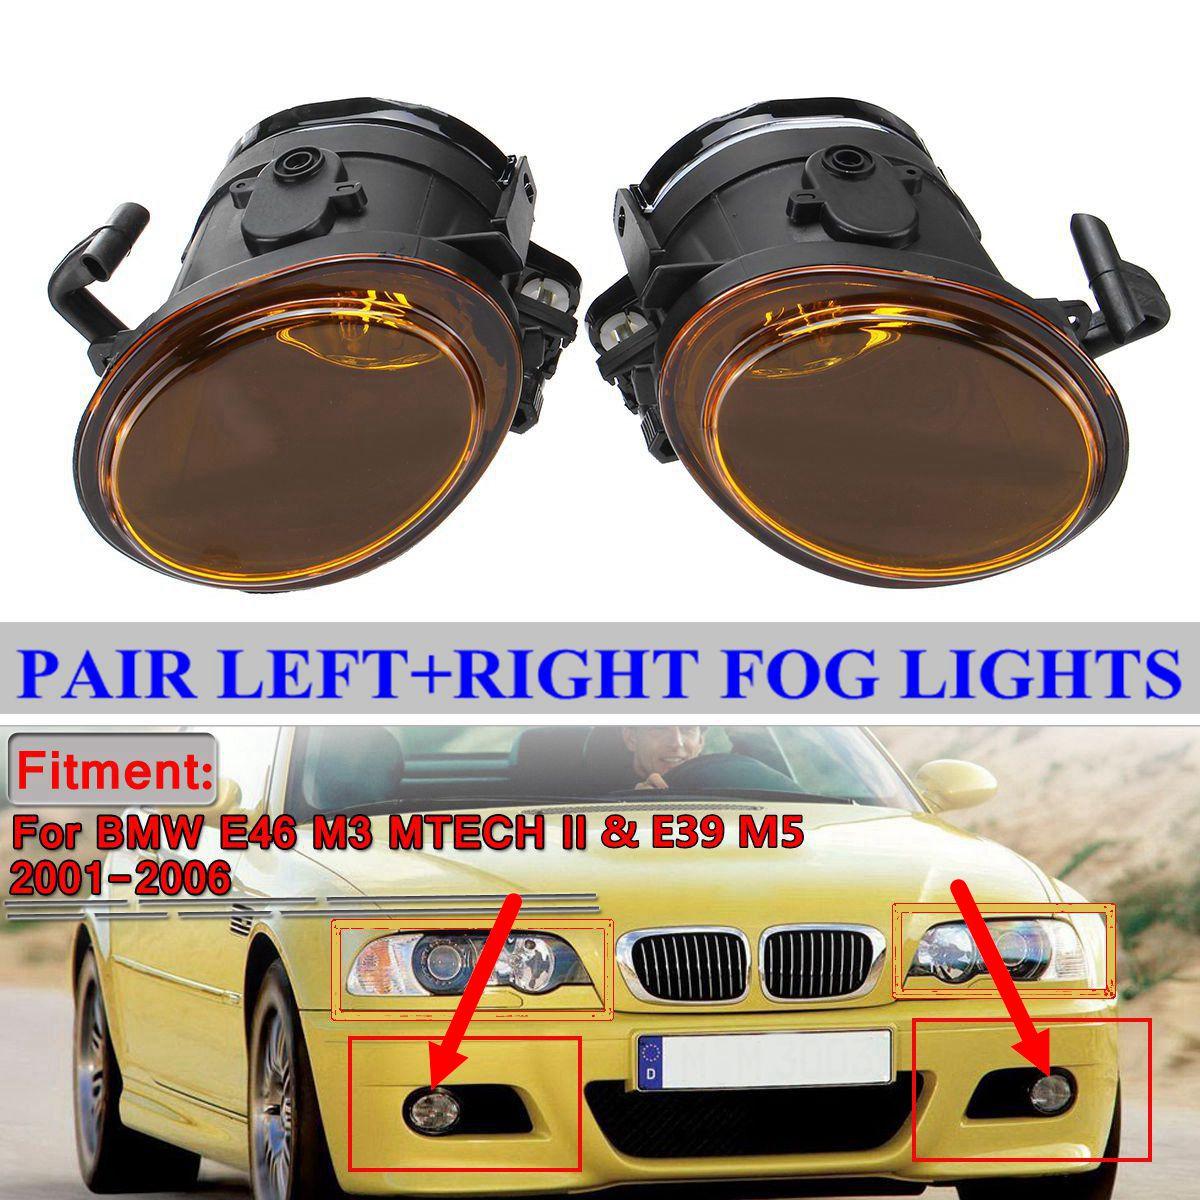 Amber Yellow 2x E46 Car Front Fog Light Assembly For BMW E46 M3 & MTECH II & E39 M5 2001-2006 No Bulbs Fog Lamp 63177894018